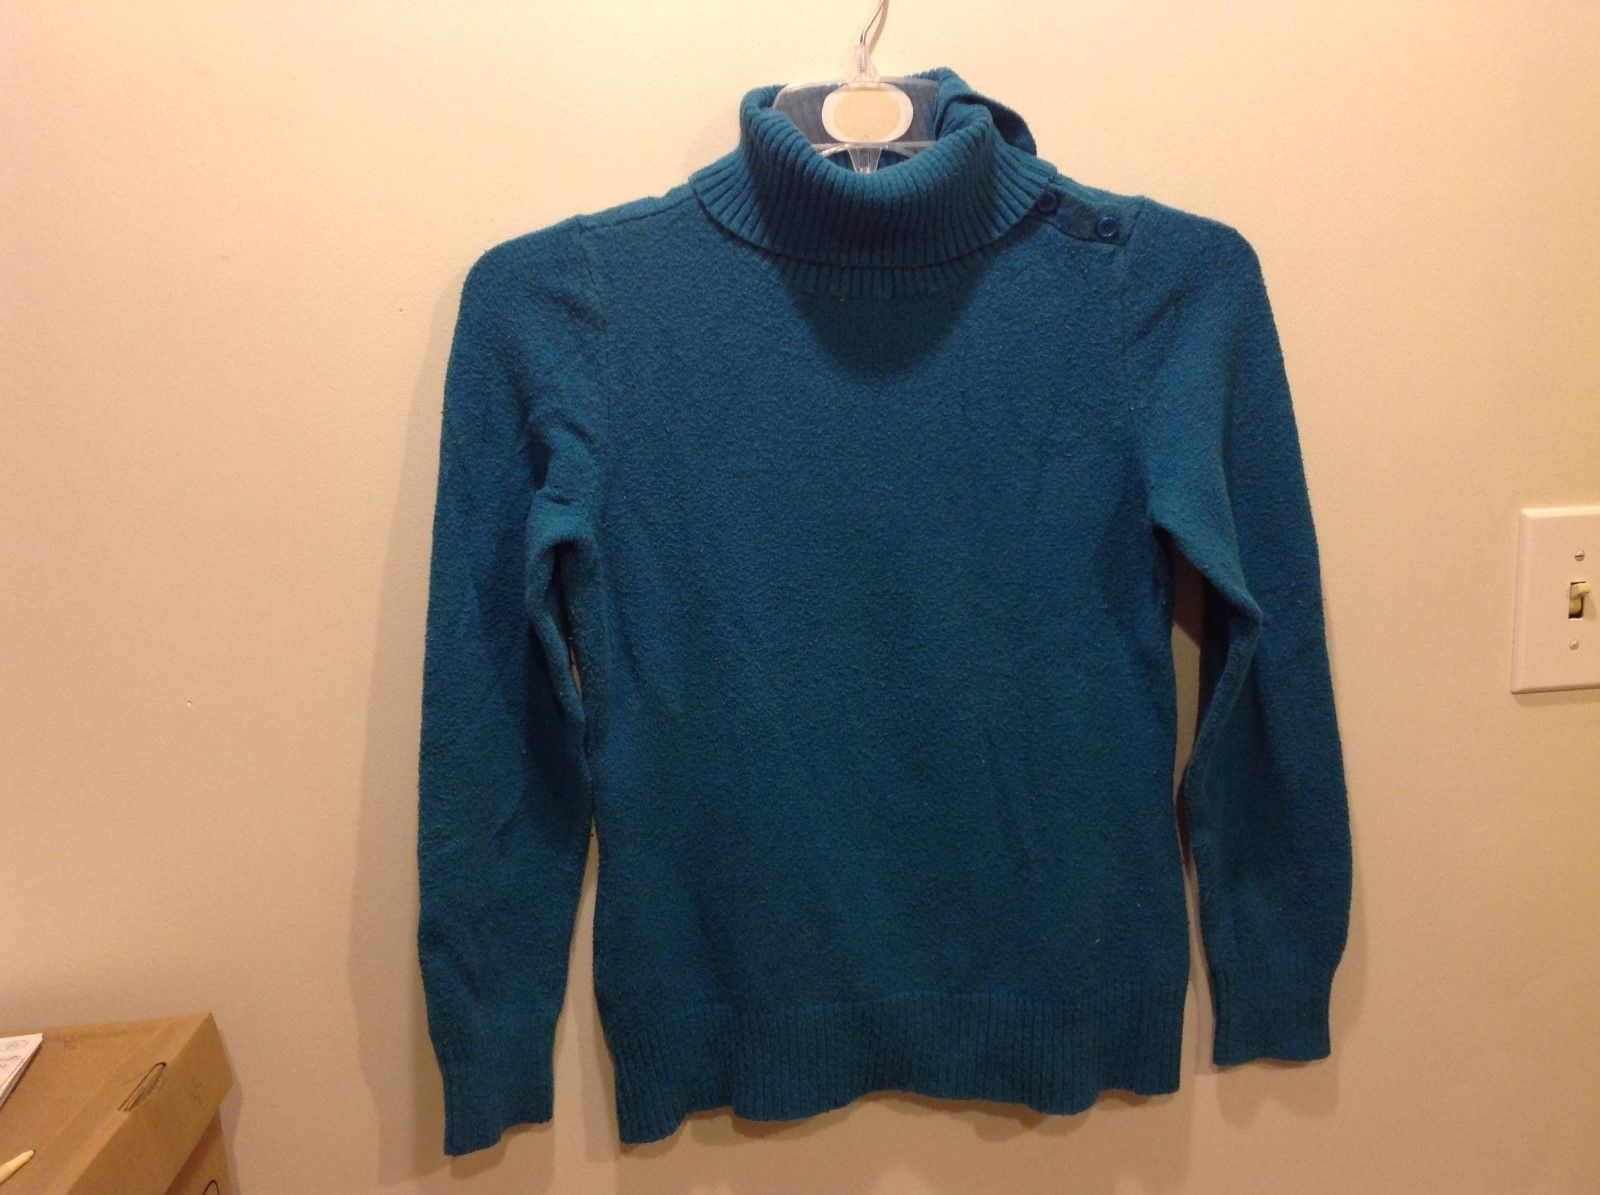 St John's Bay Sea-Toned Teal Turtleneck Sweater w Neck Buttons Sz Medium